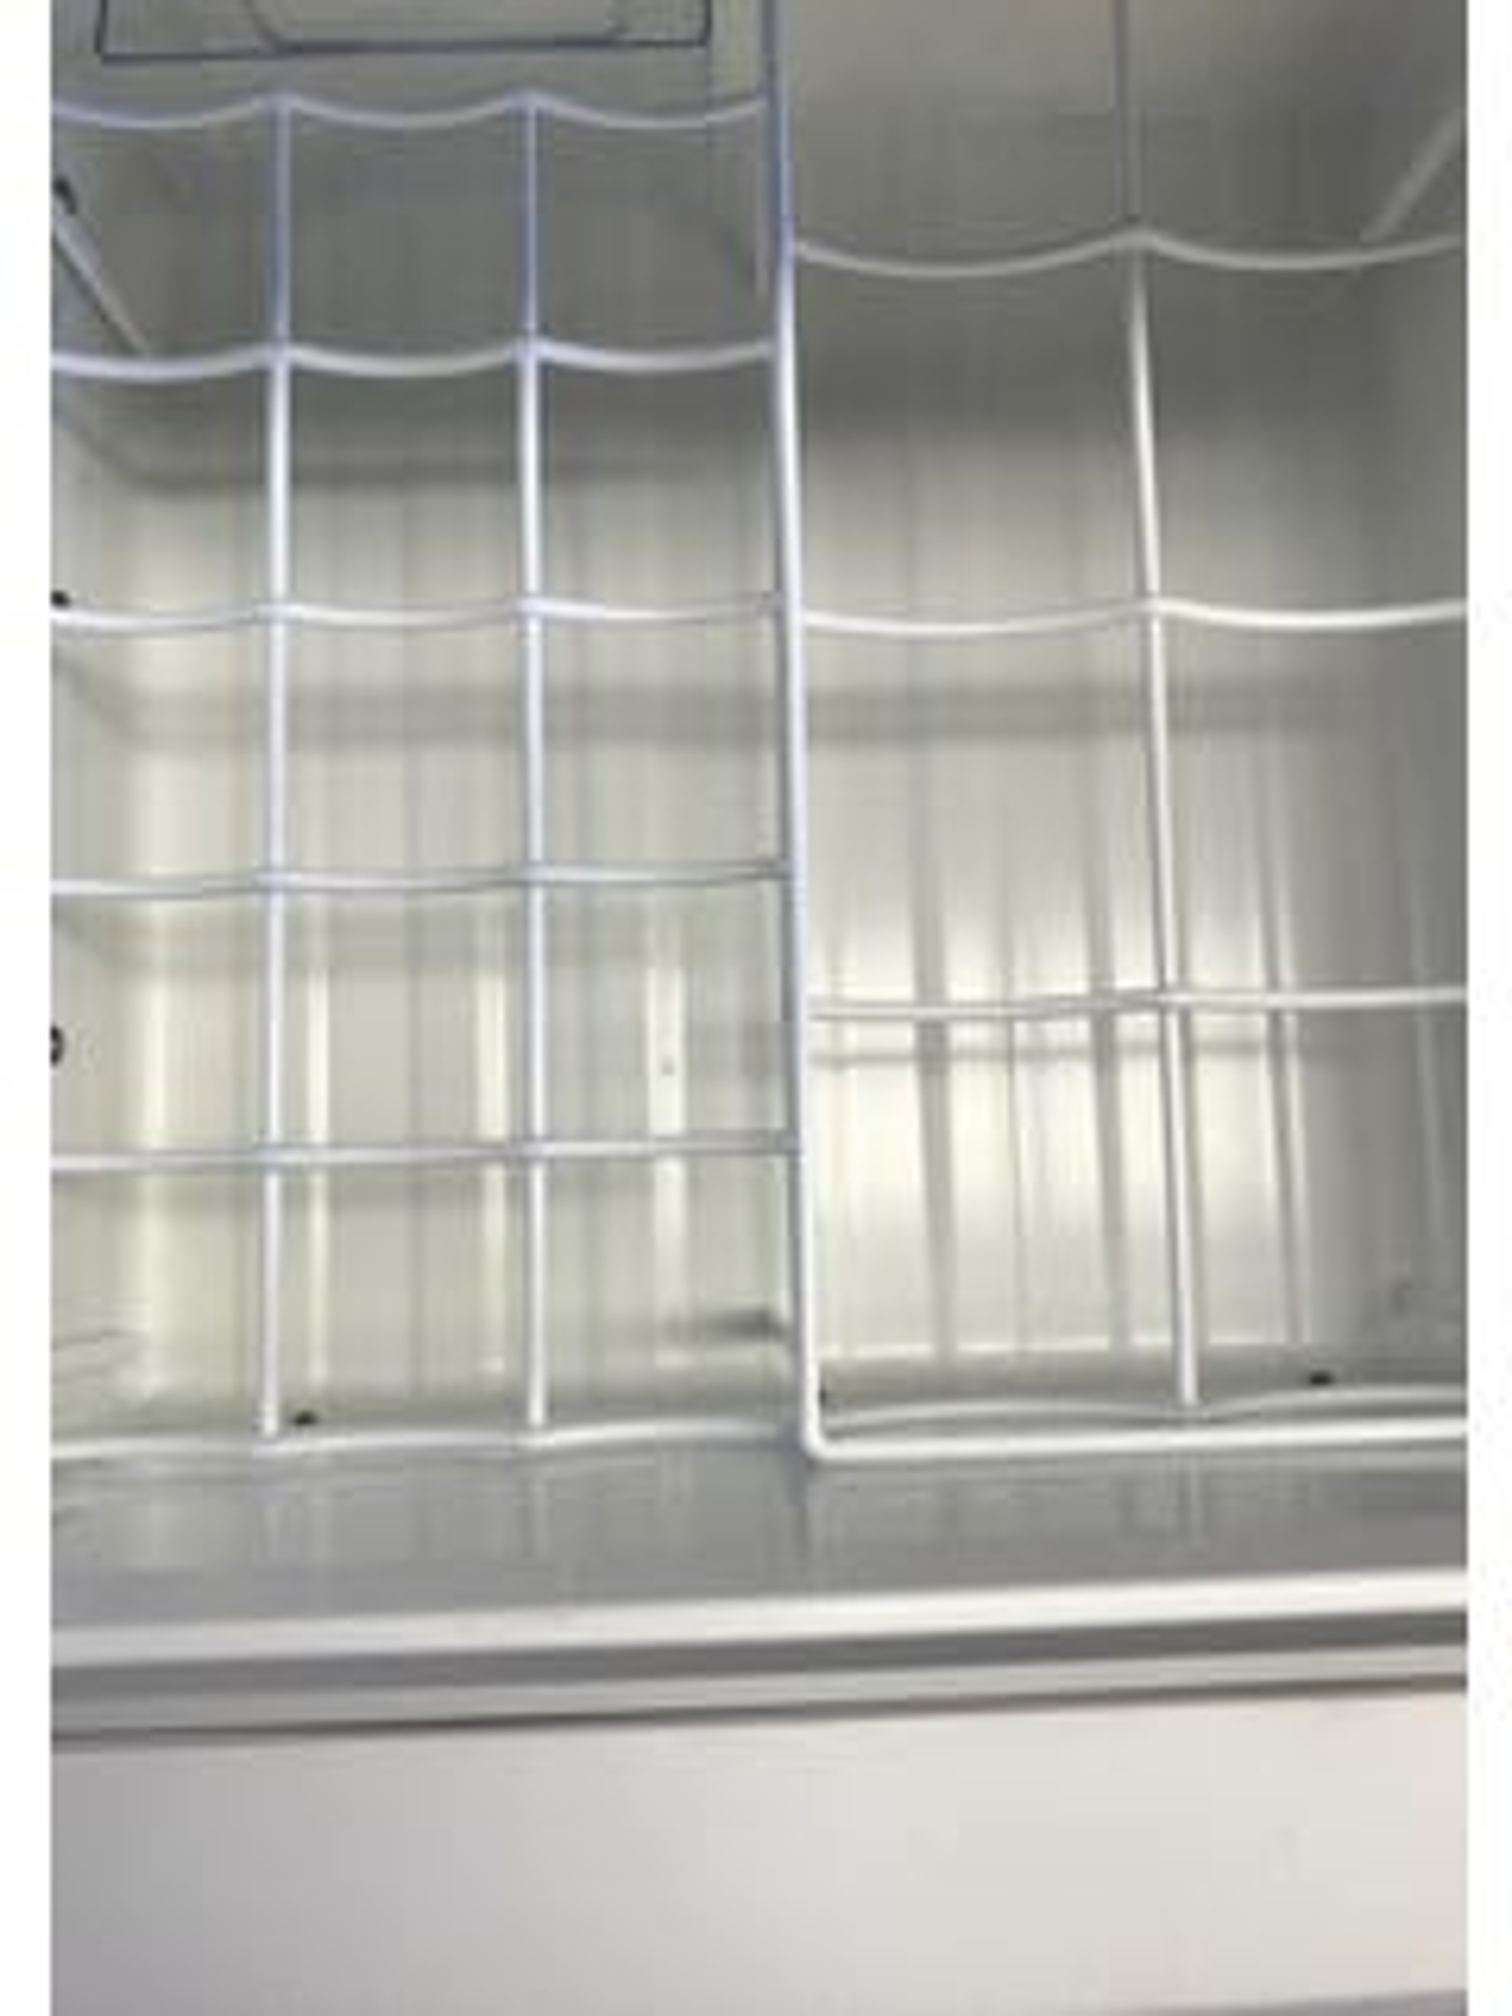 Creche PNRMC-DVR Refrigerator Divider System